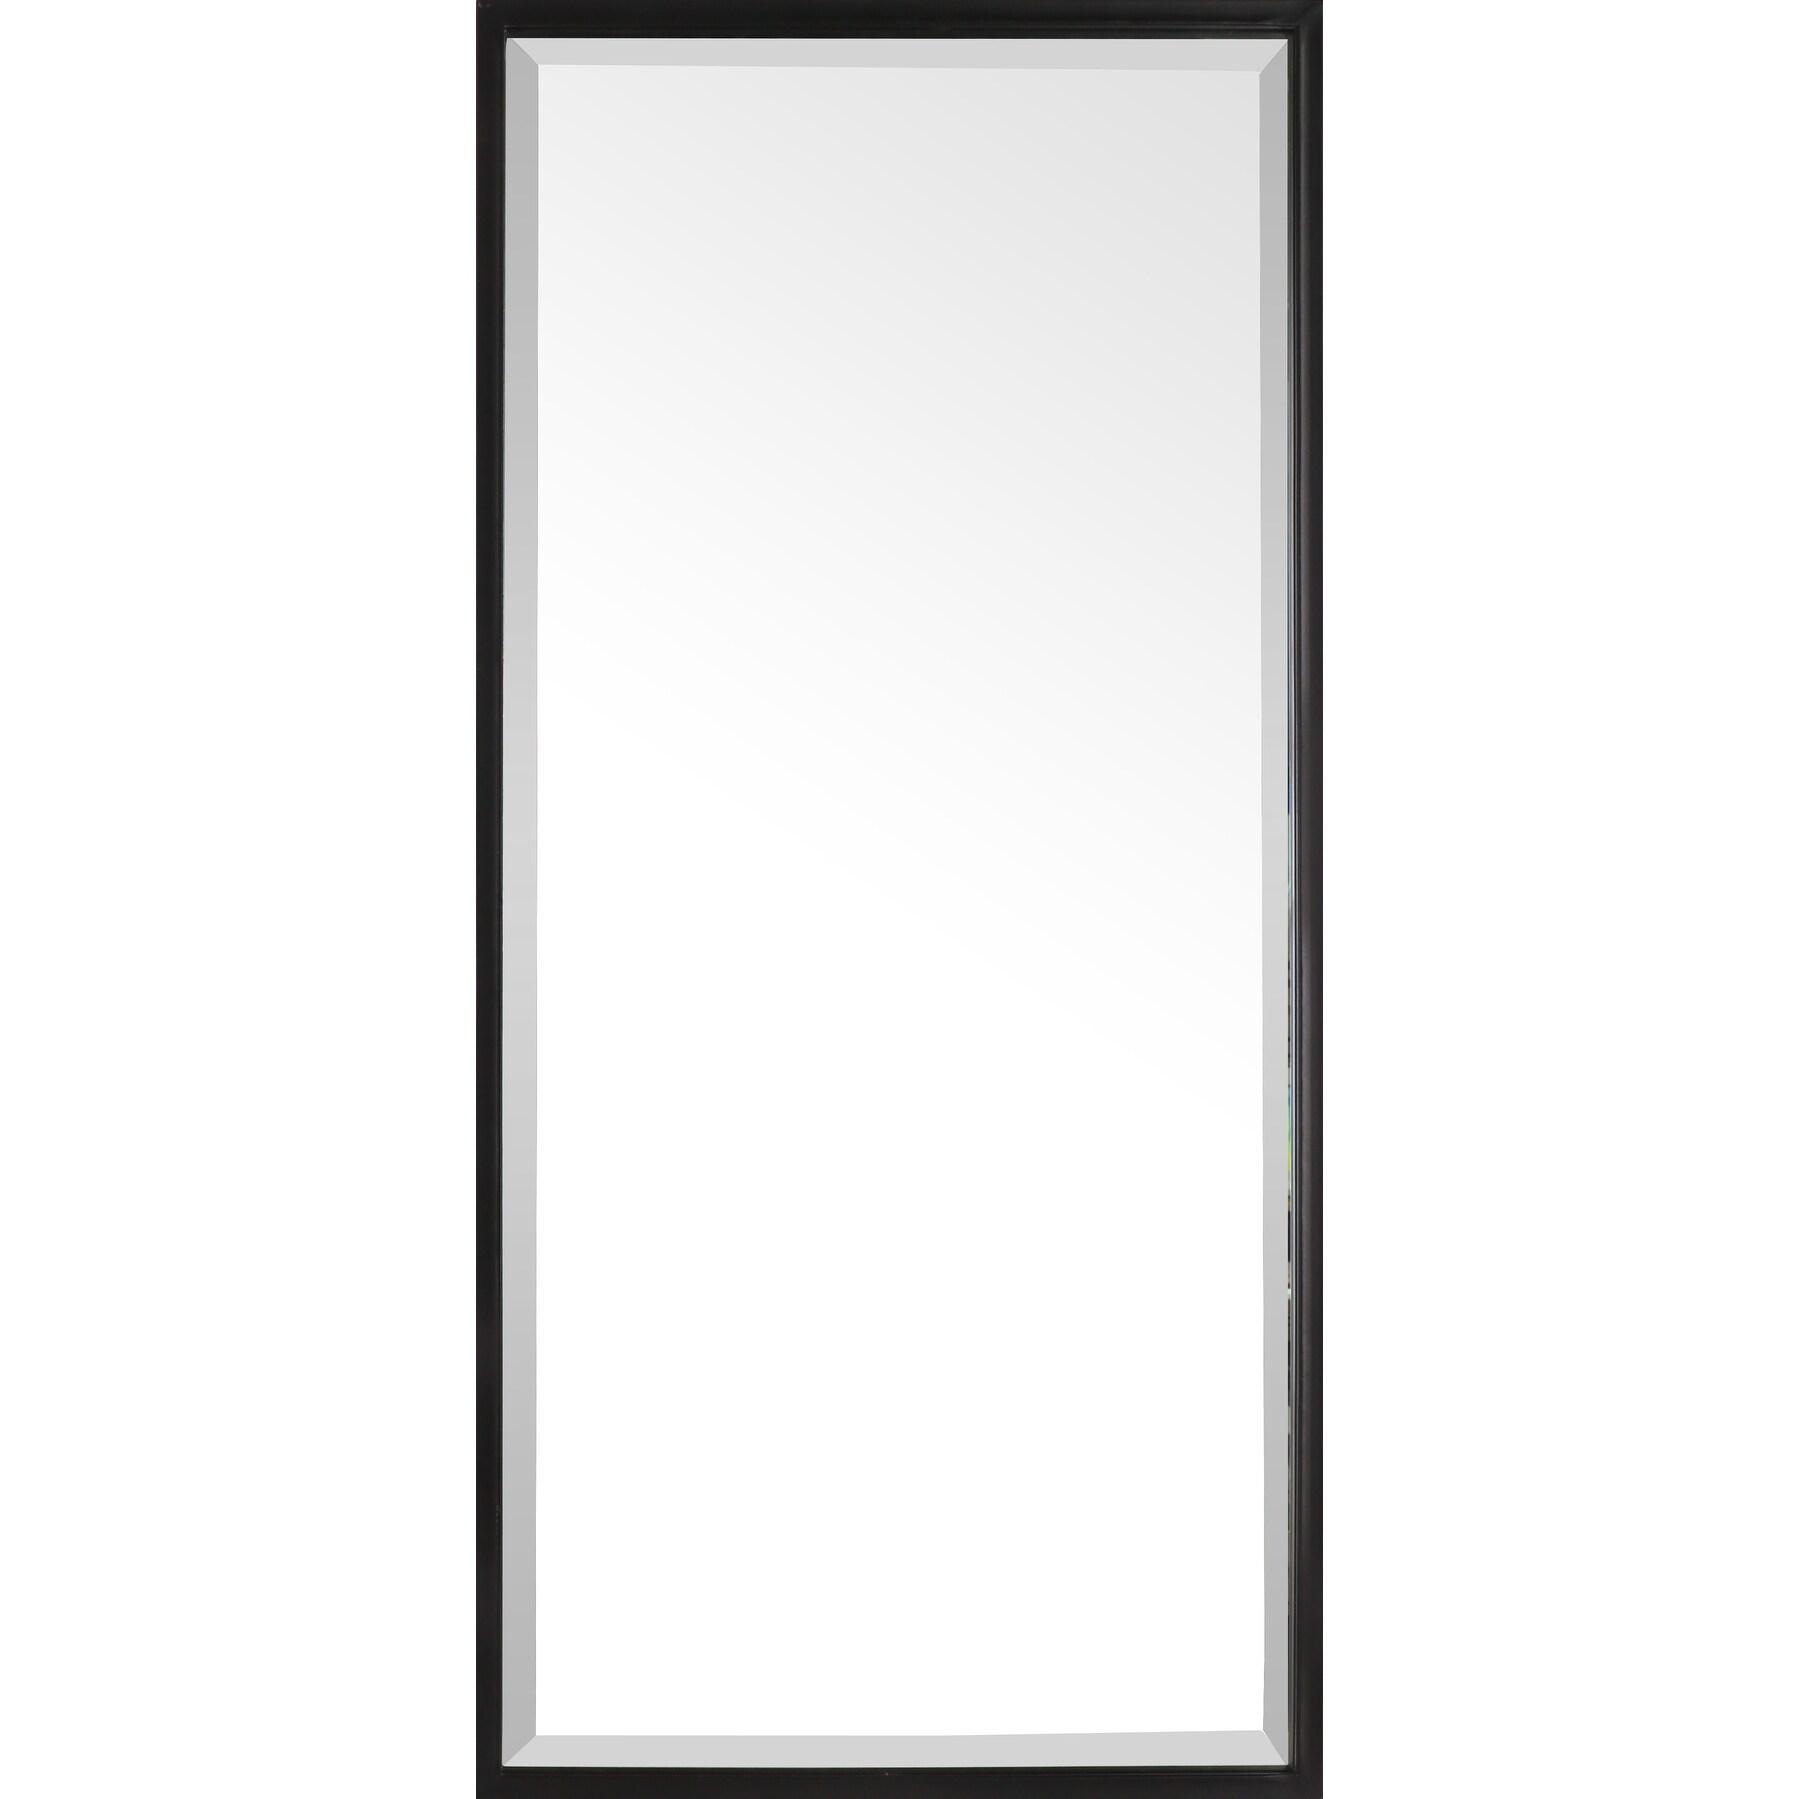 35x16 framed beveled vanity wall mirror black rectangle modern industrial large long metal frame mirrors for entryway bathroom